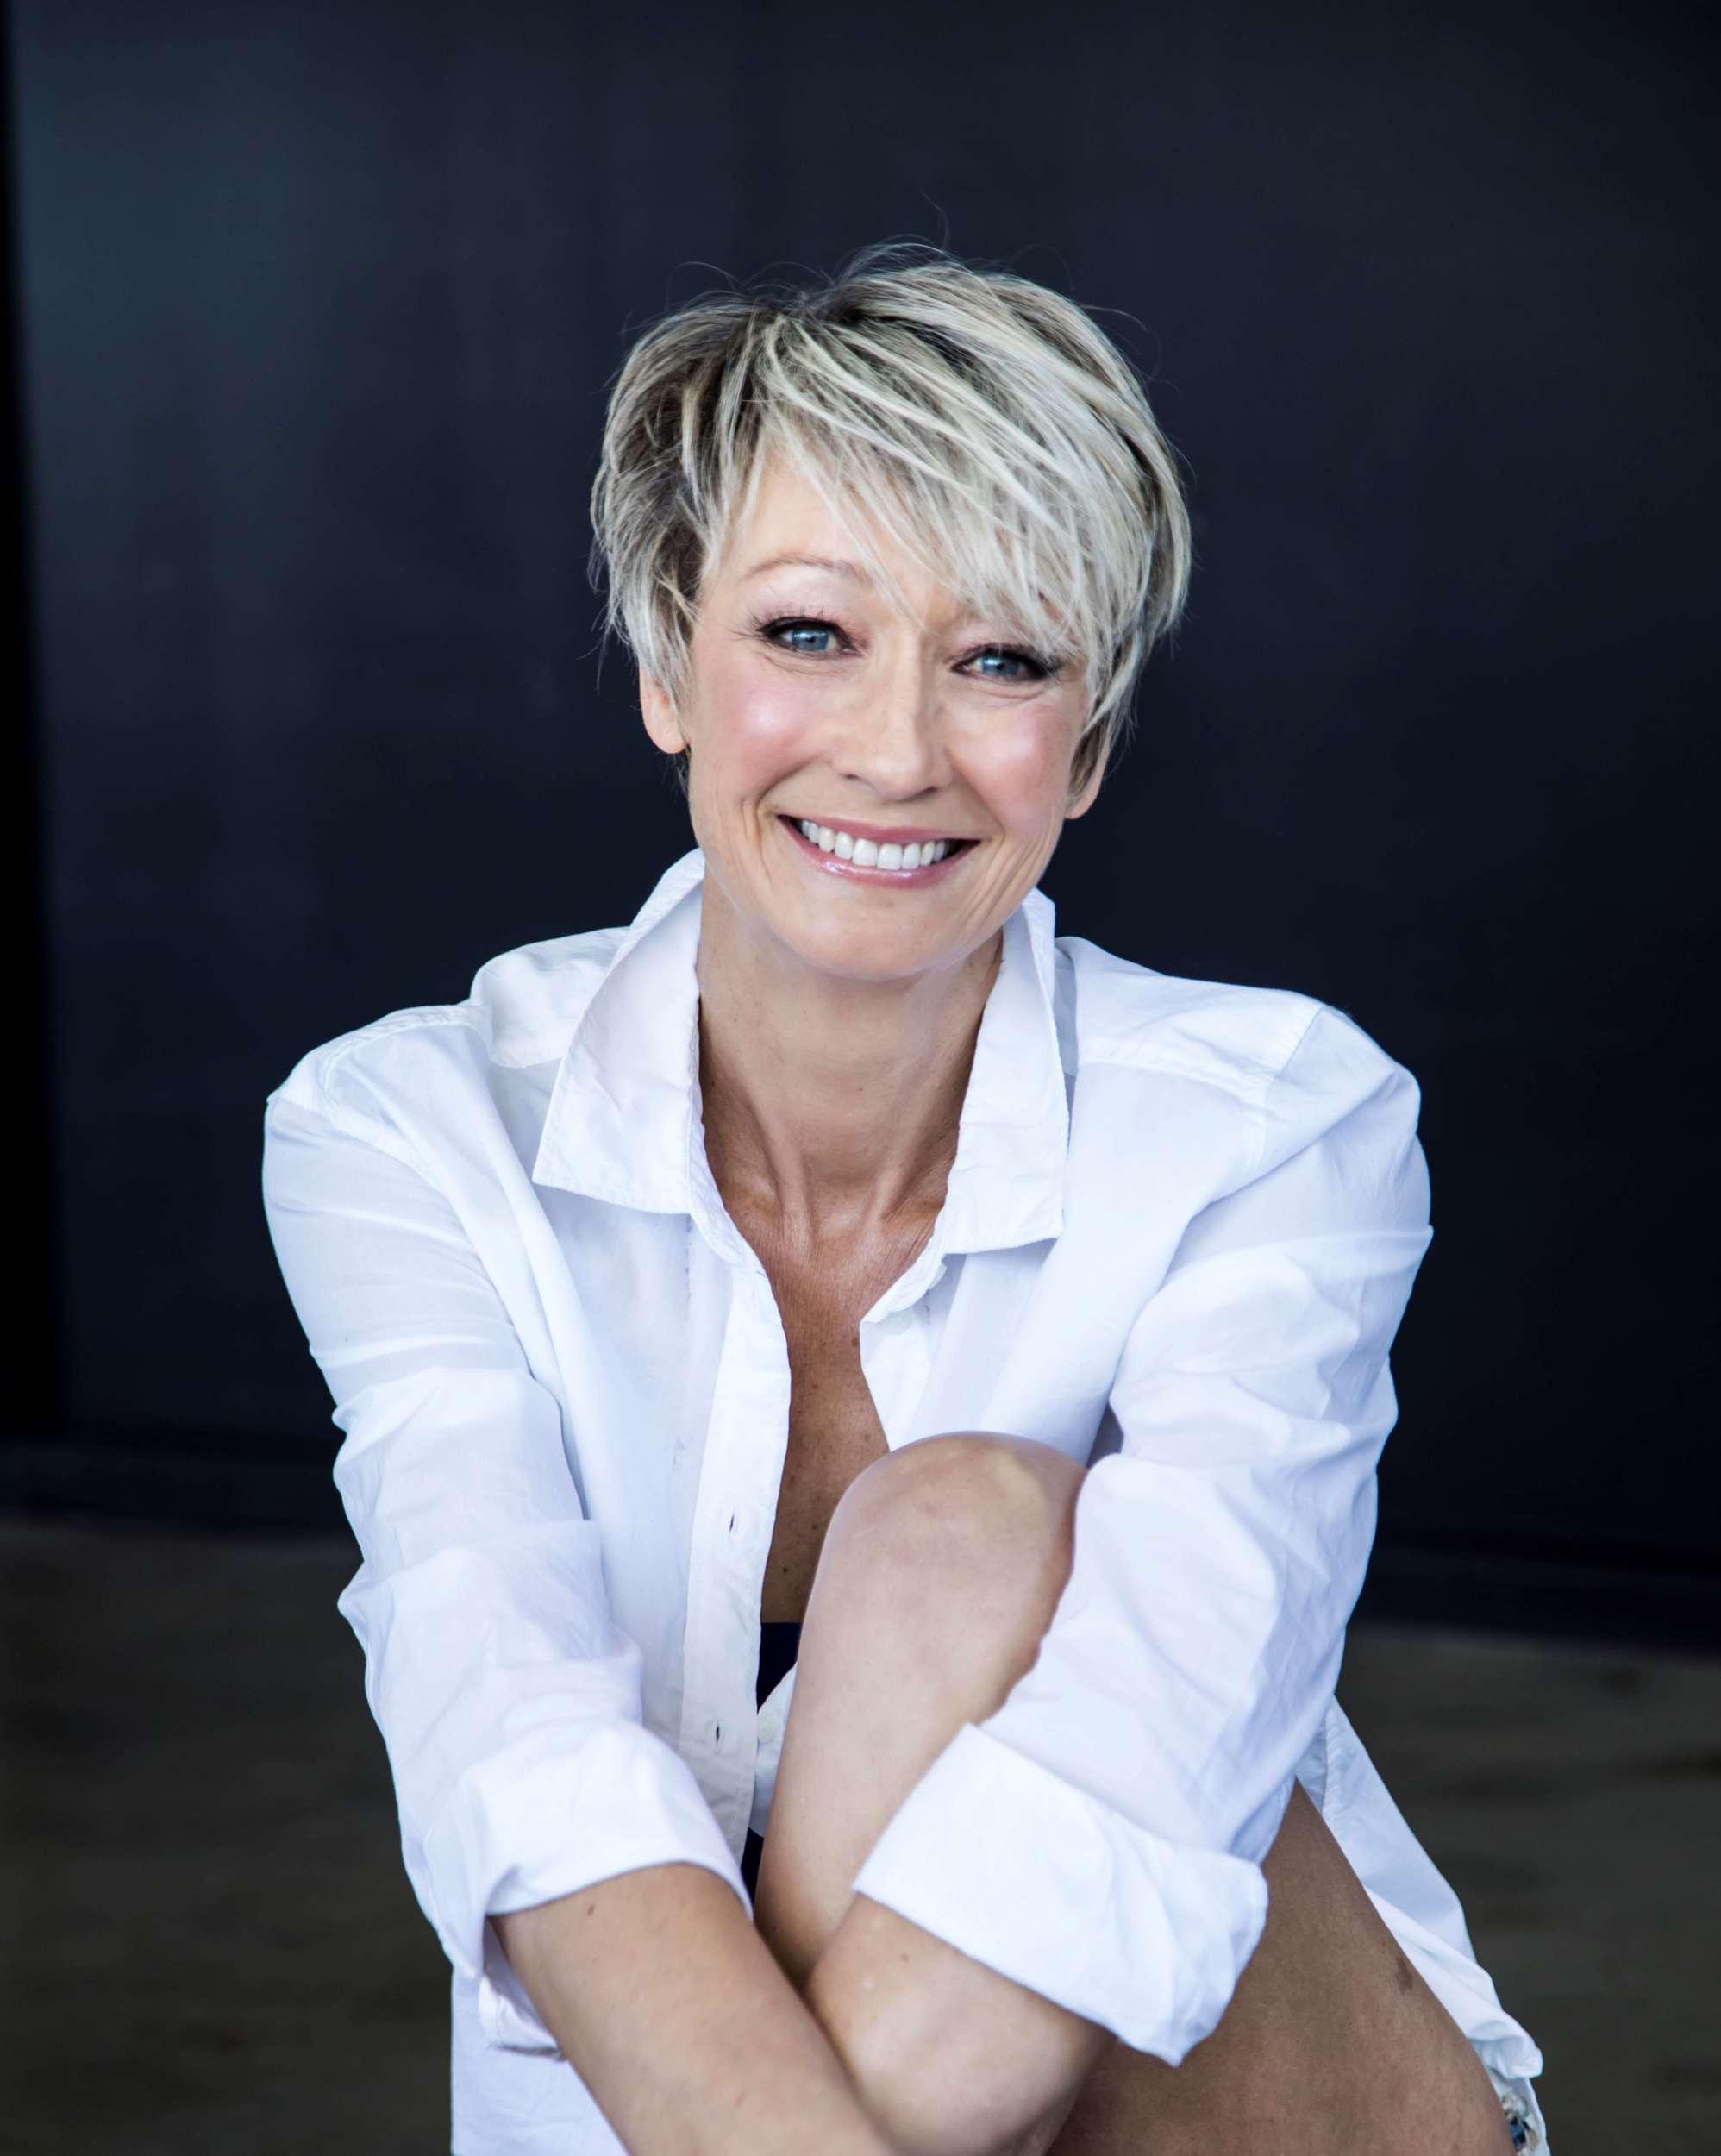 Jane Fullerton-Smith